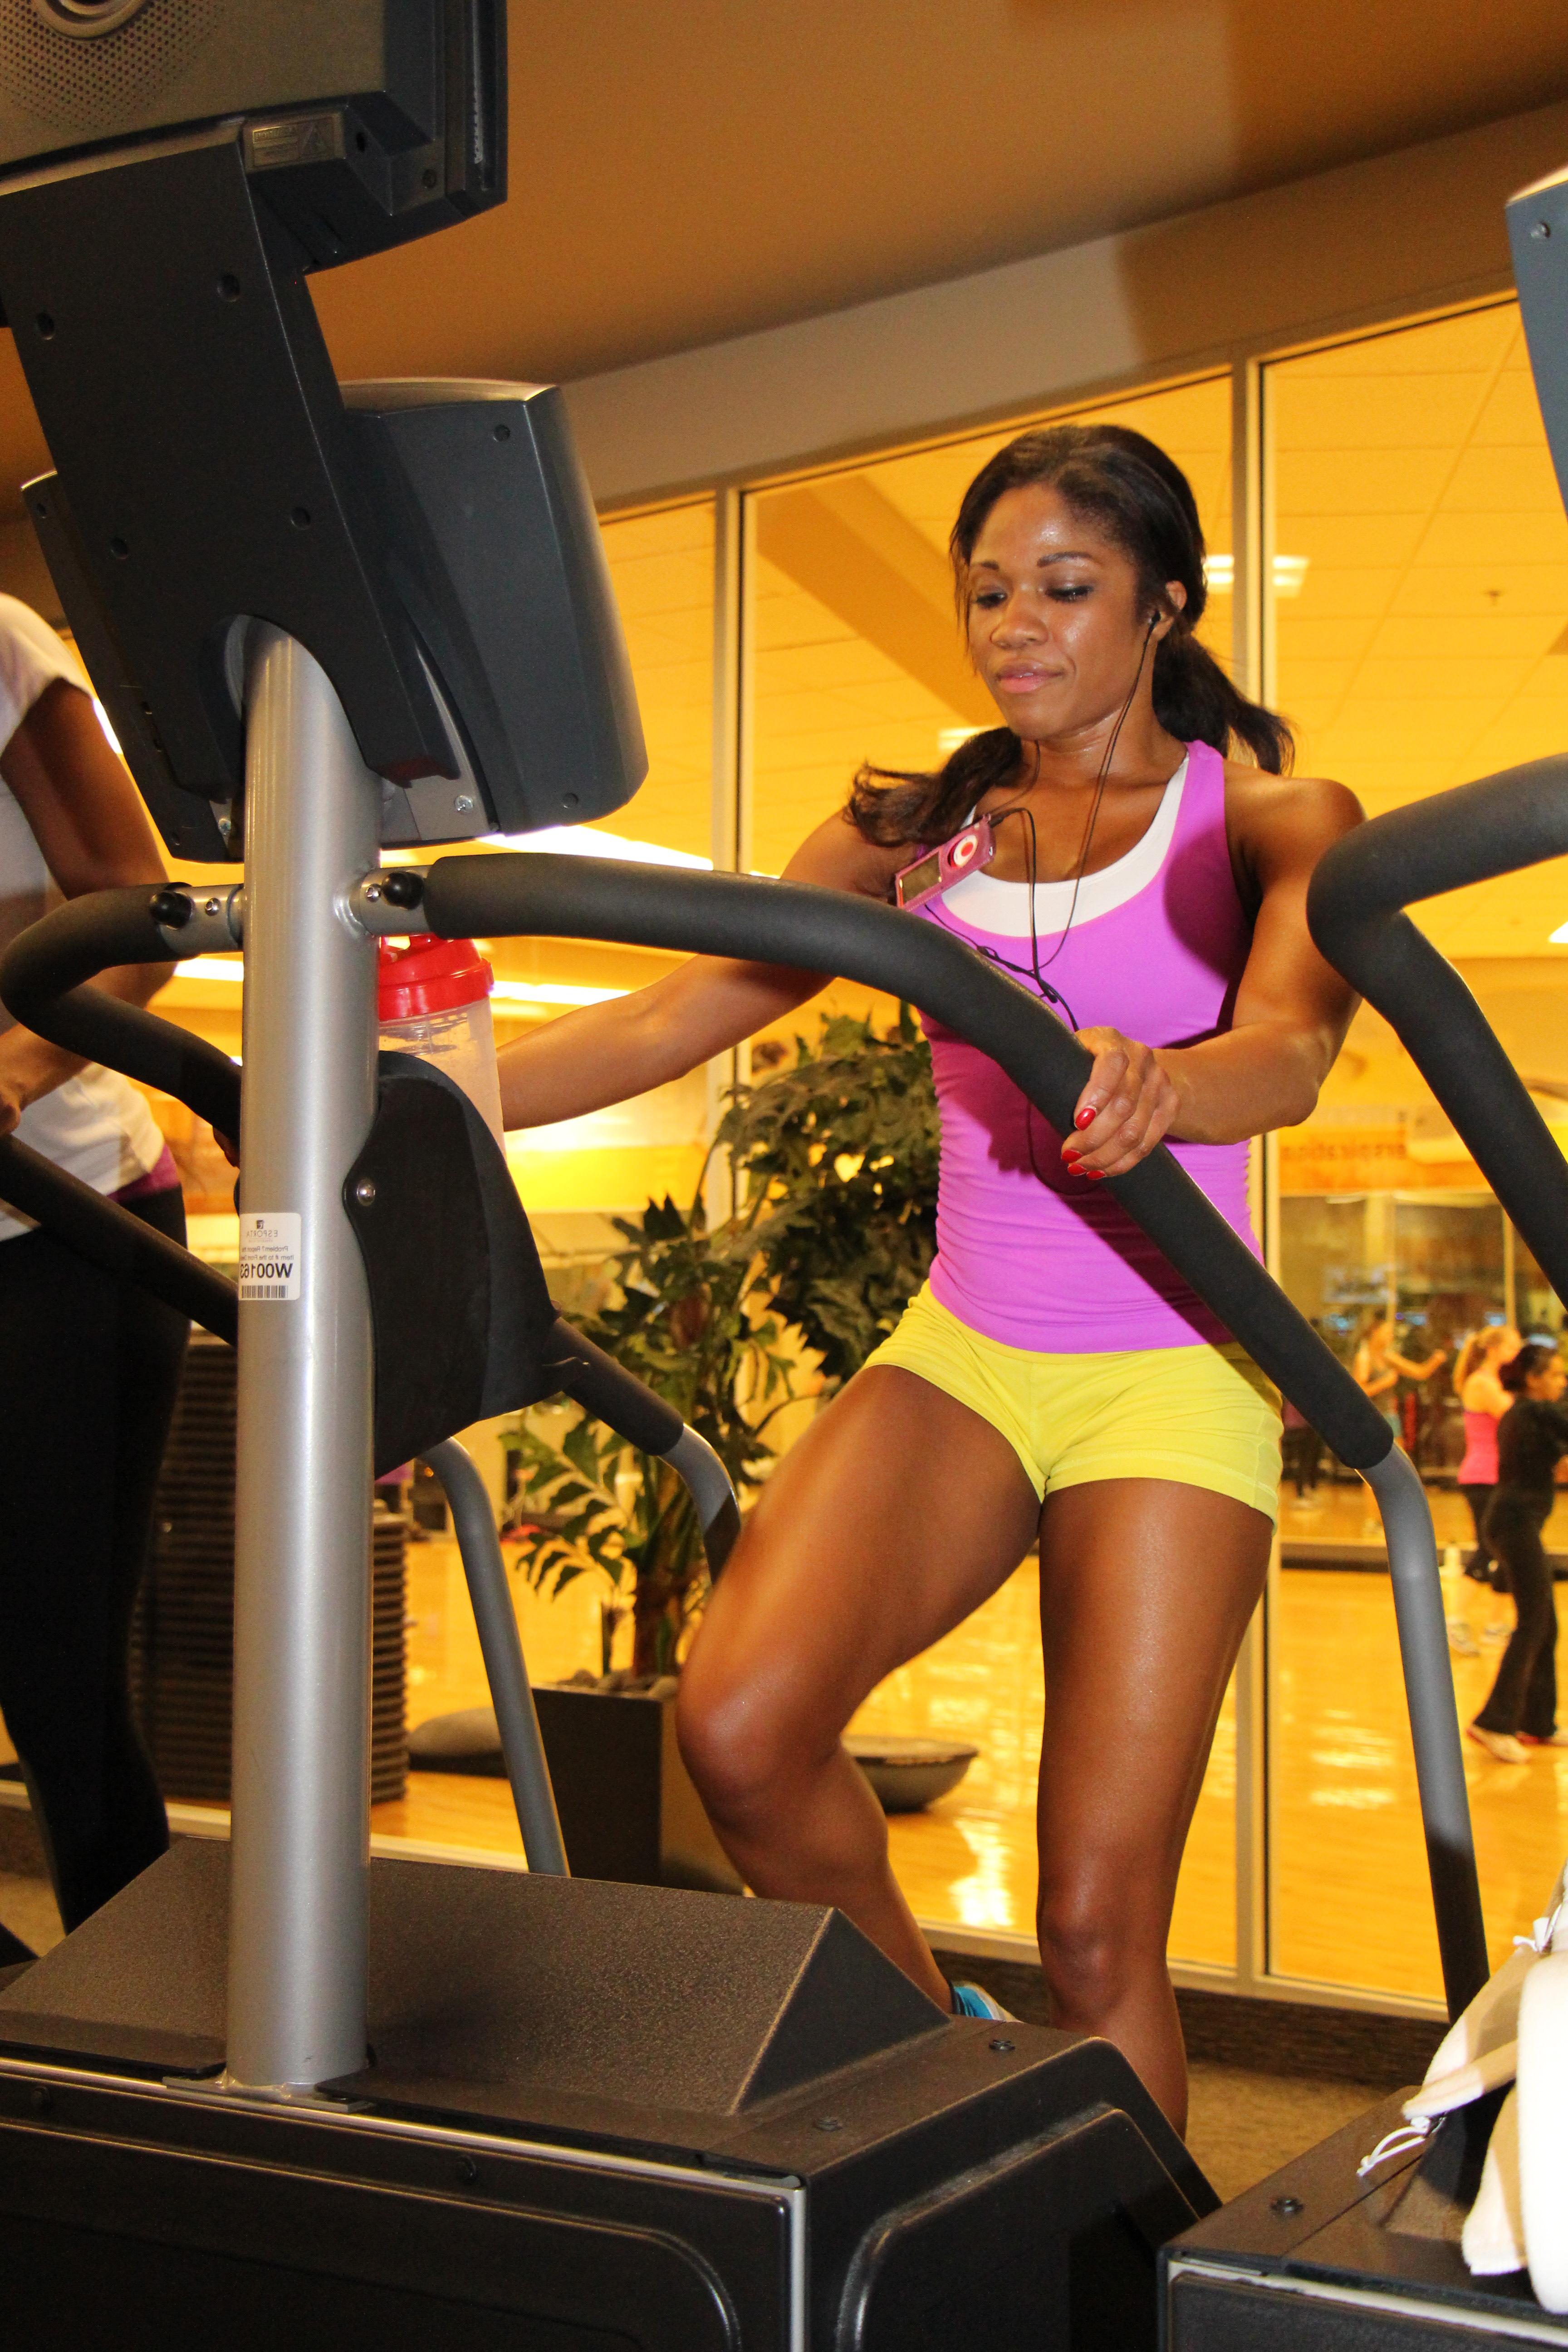 Denita-at-LA-Fitness-using-stairmaster